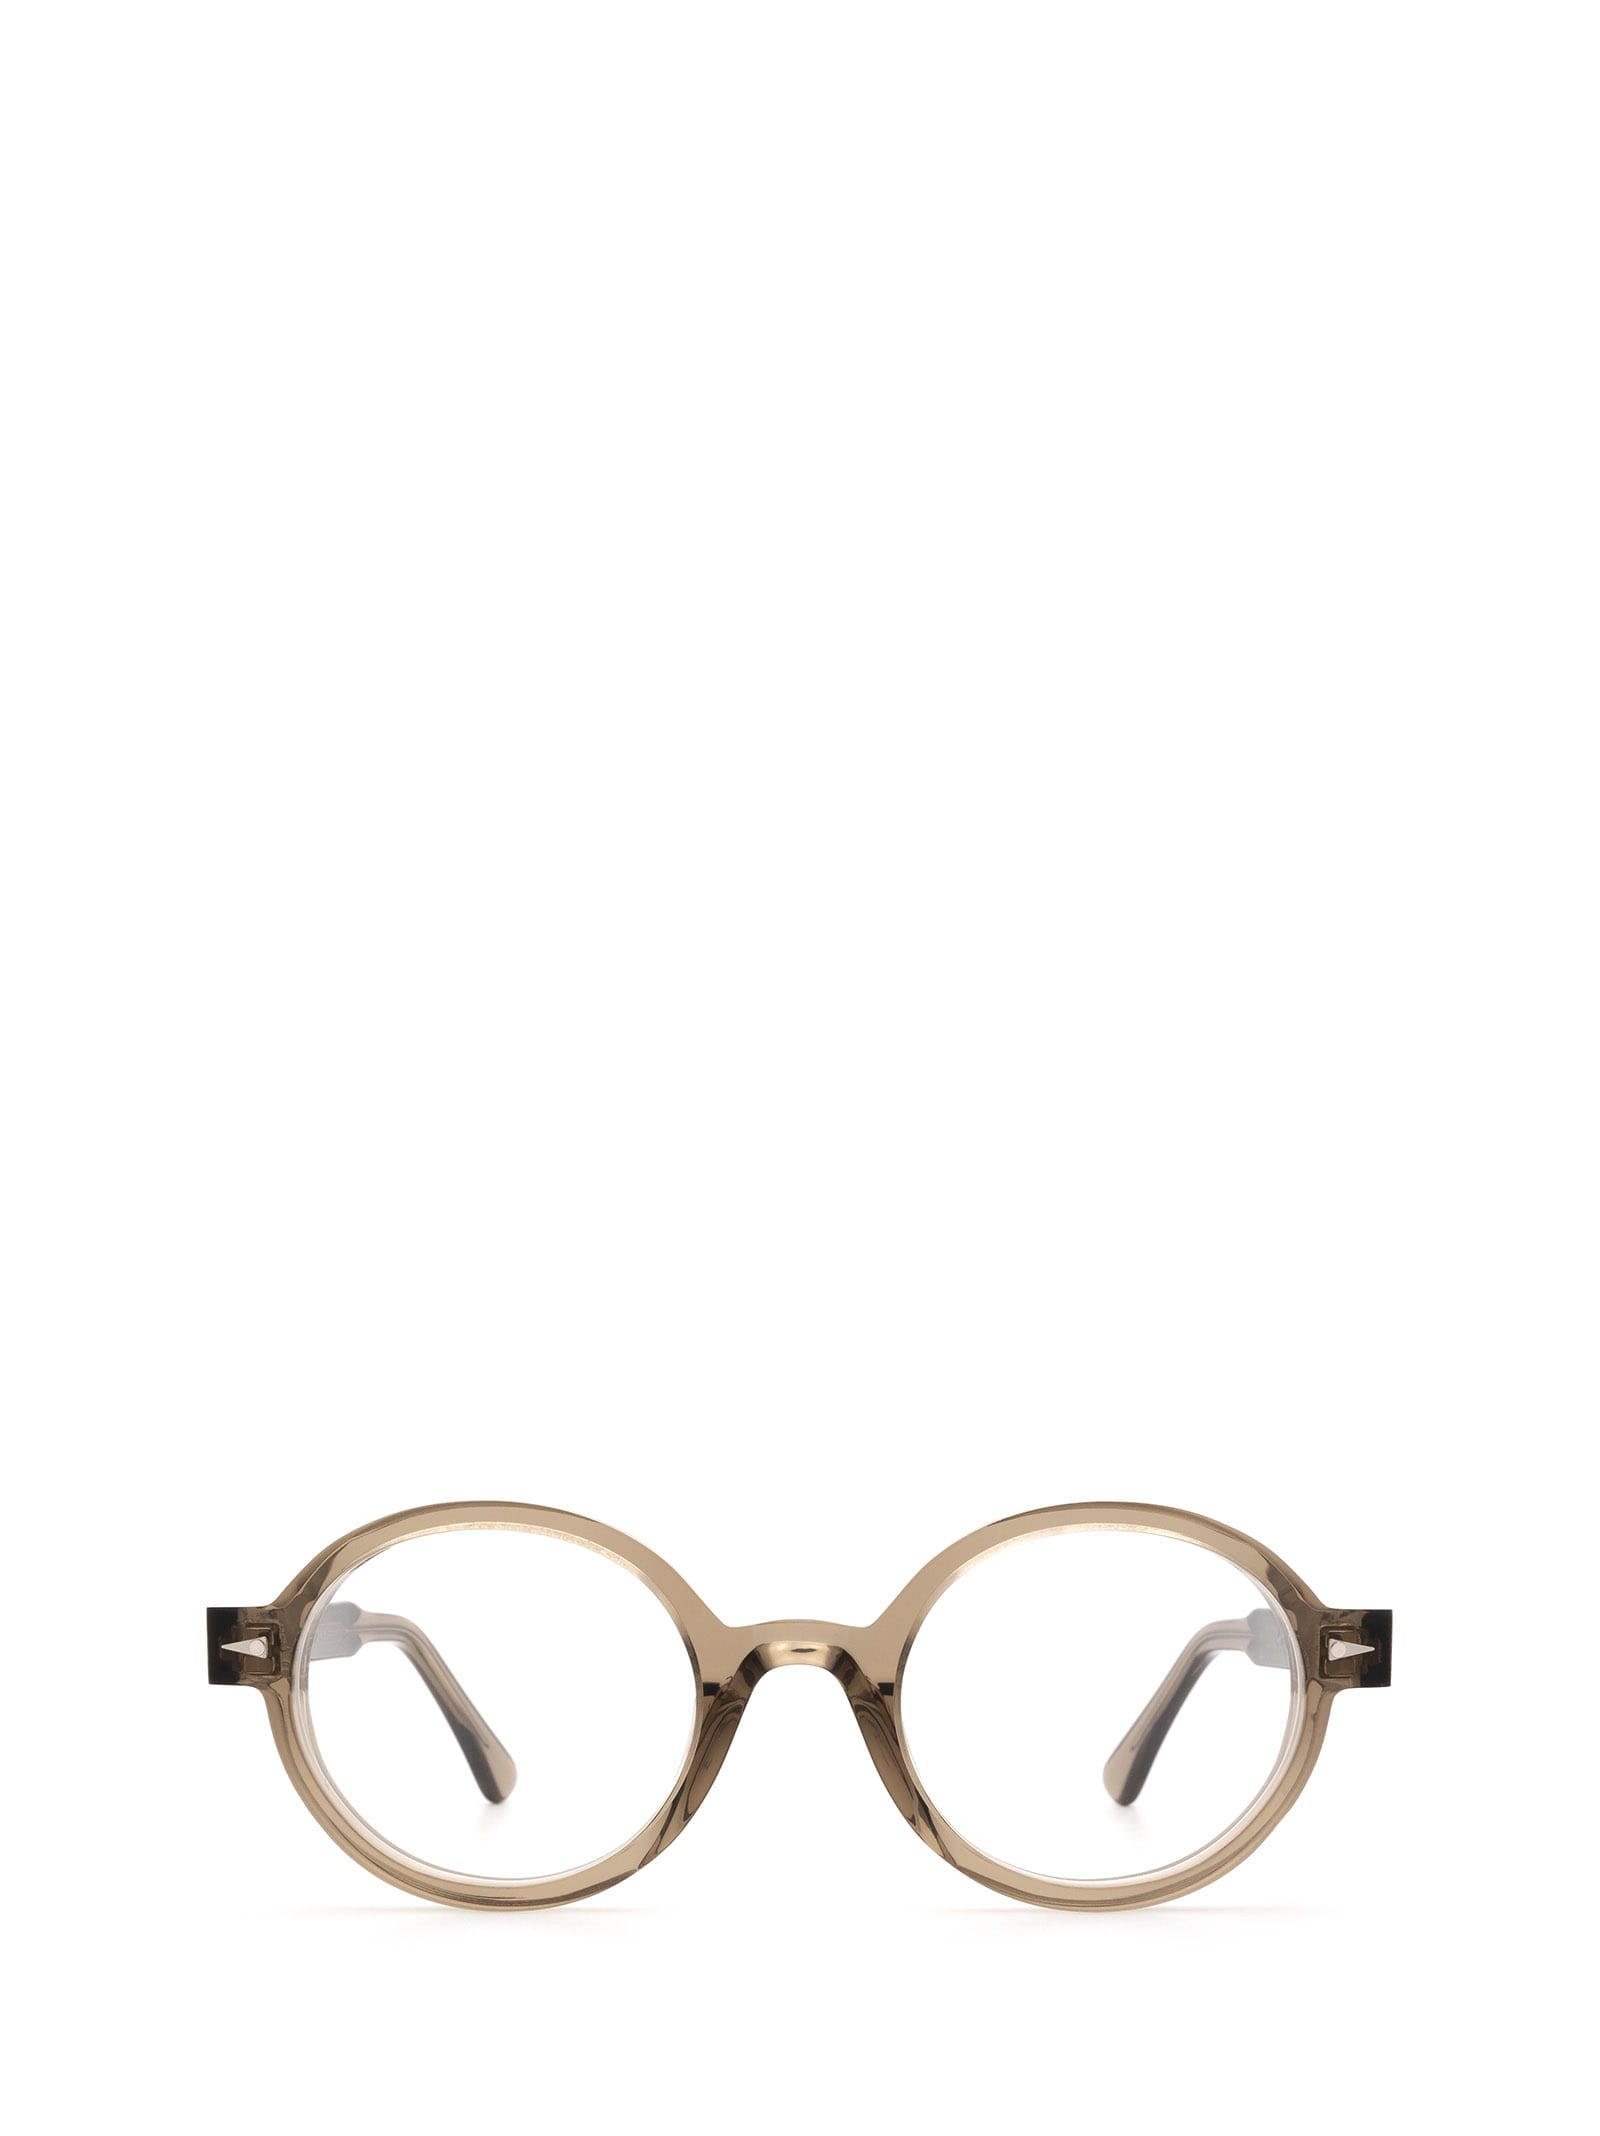 AHLEM Ahlem Rue Leon Optic Smoked Light Glasses